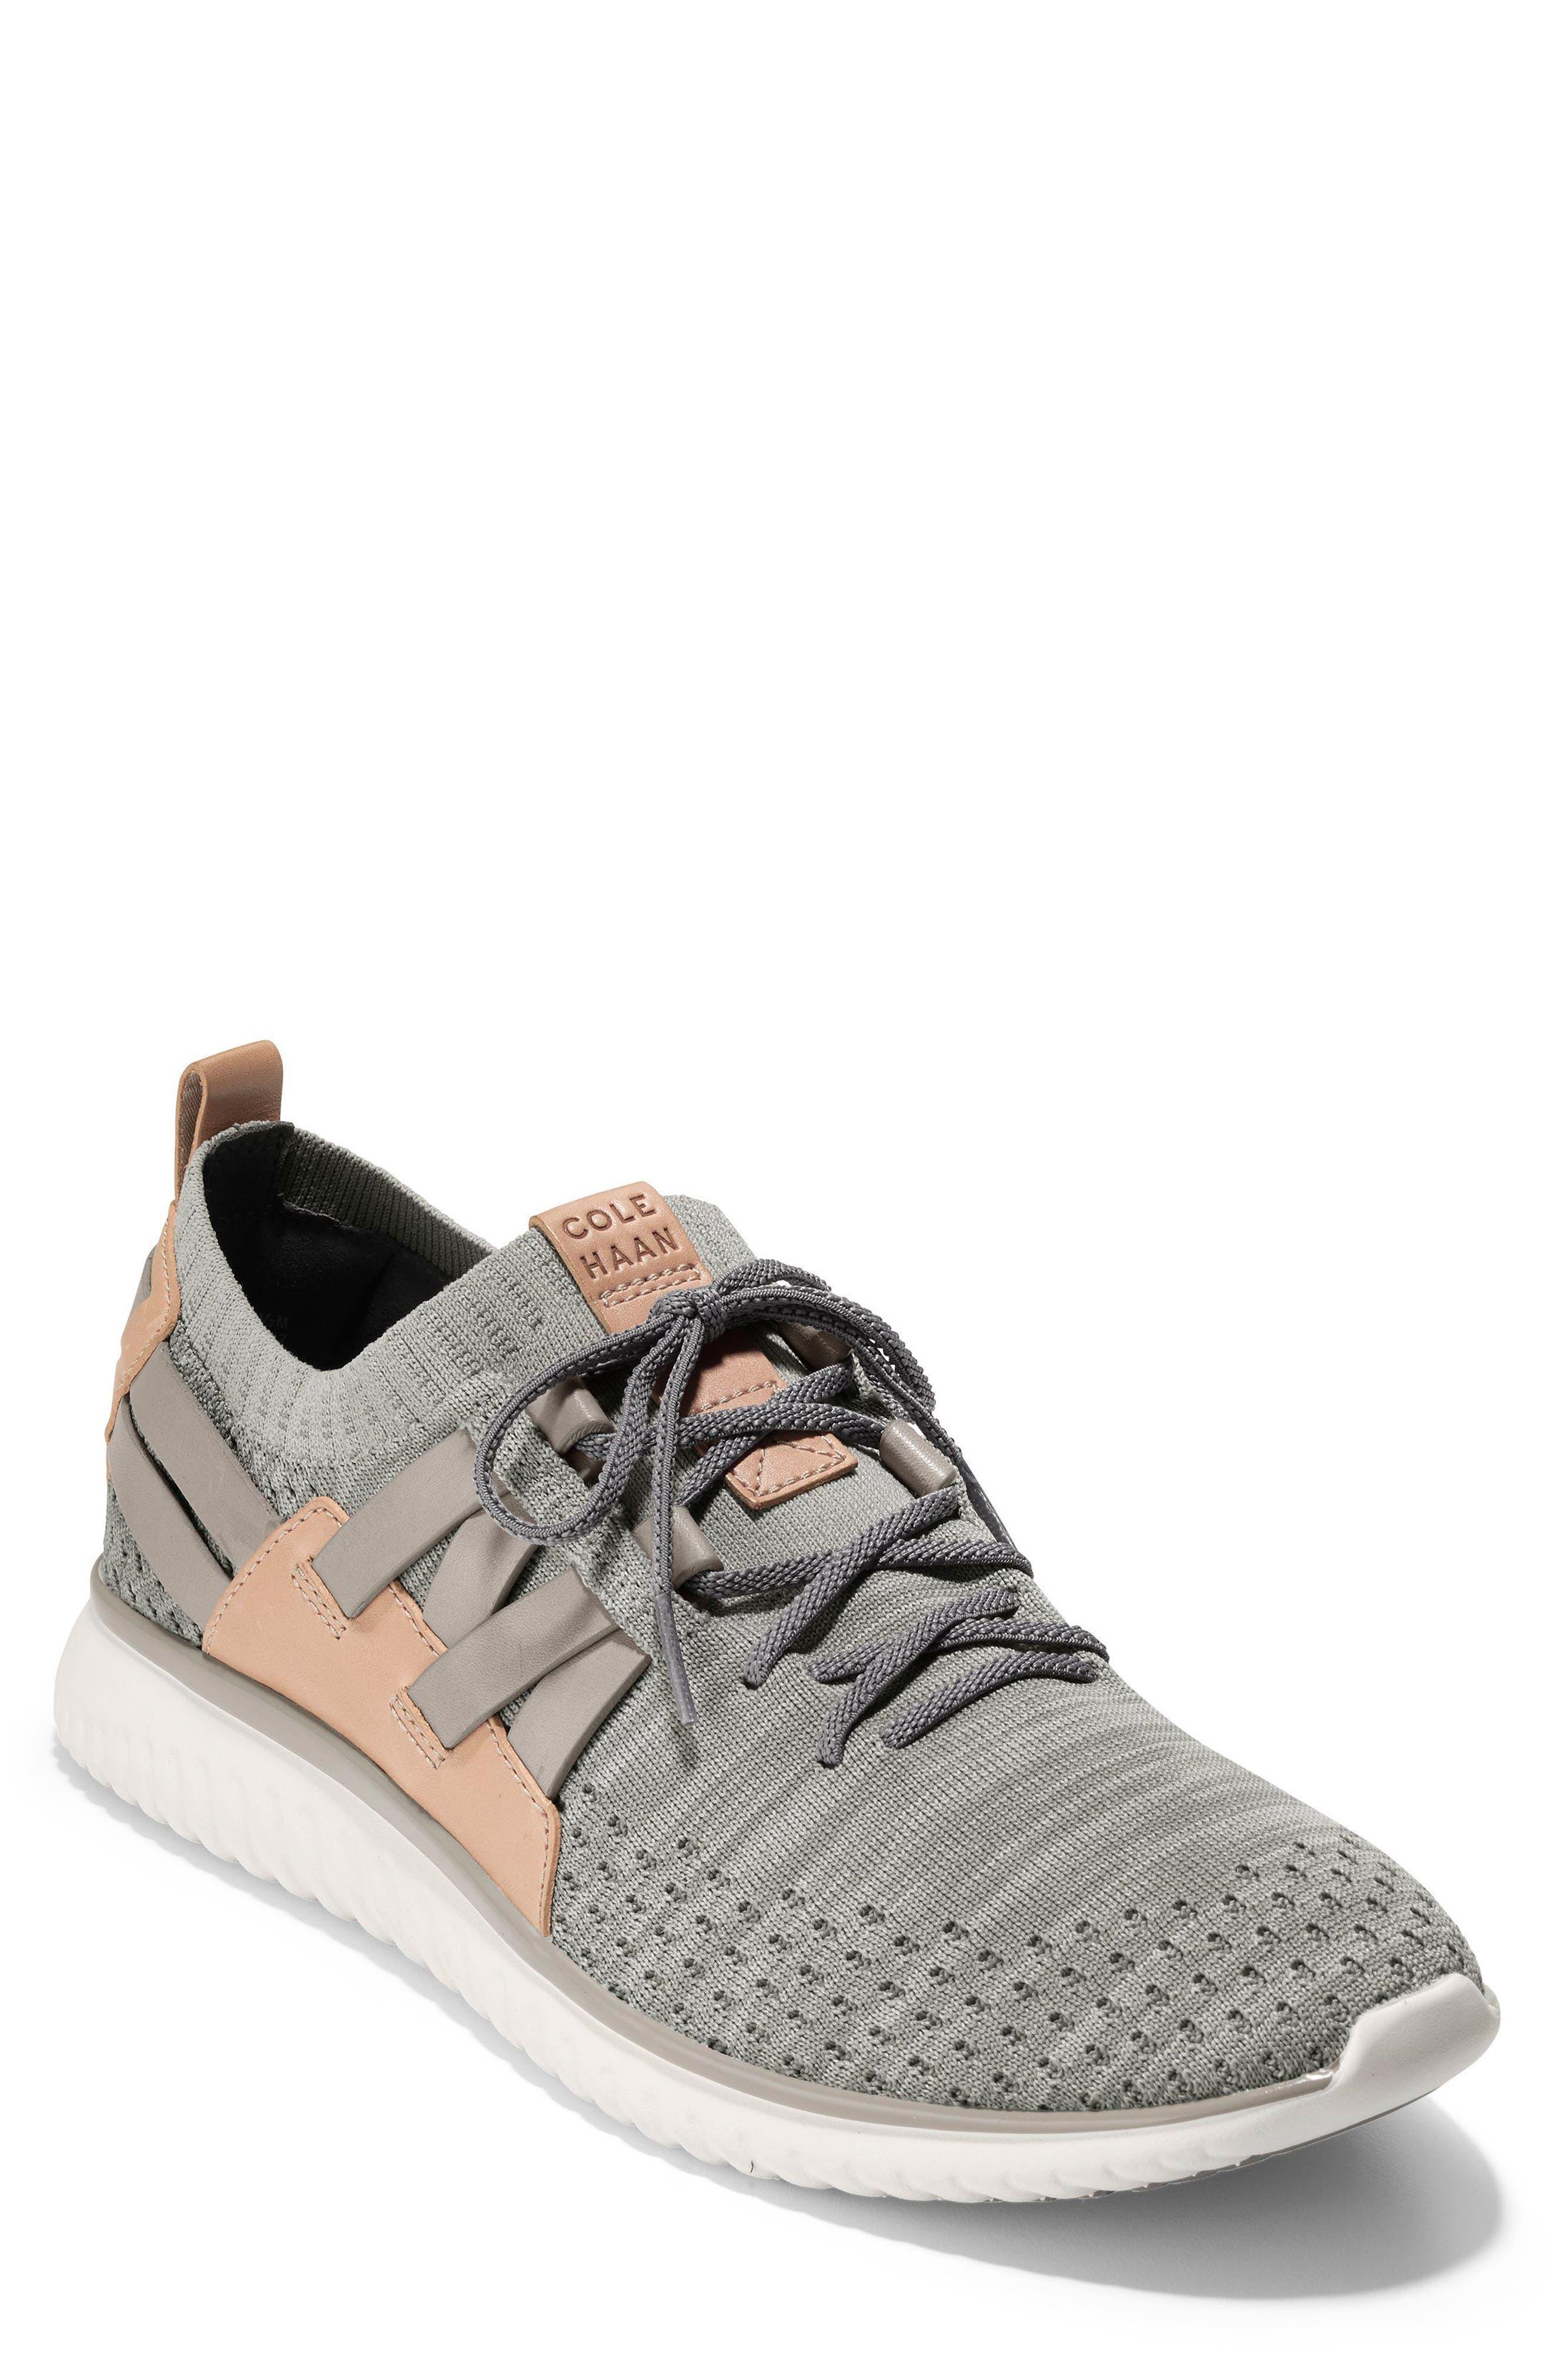 Grand Motion Sneaker,                         Main,                         color, Rockridge/ Ivory